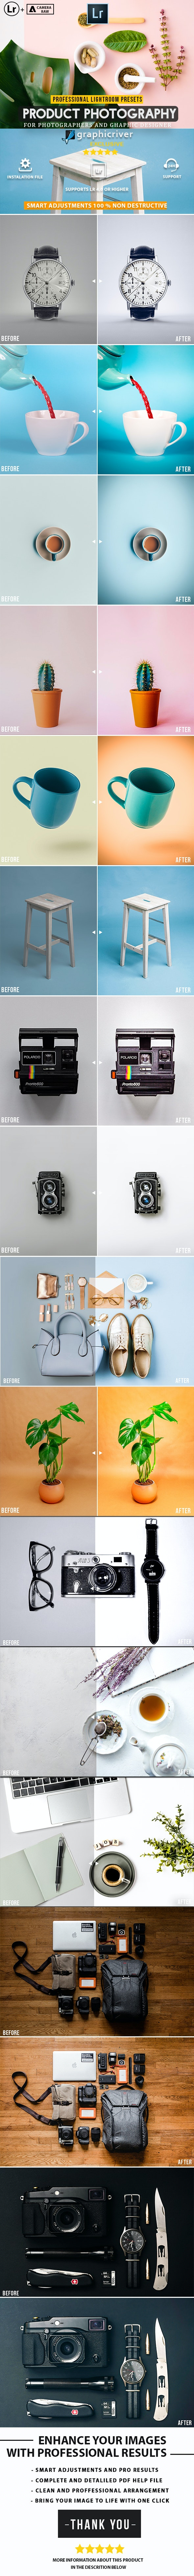 30 Product Photography Lightroom Presets - Lightroom Presets Add-ons